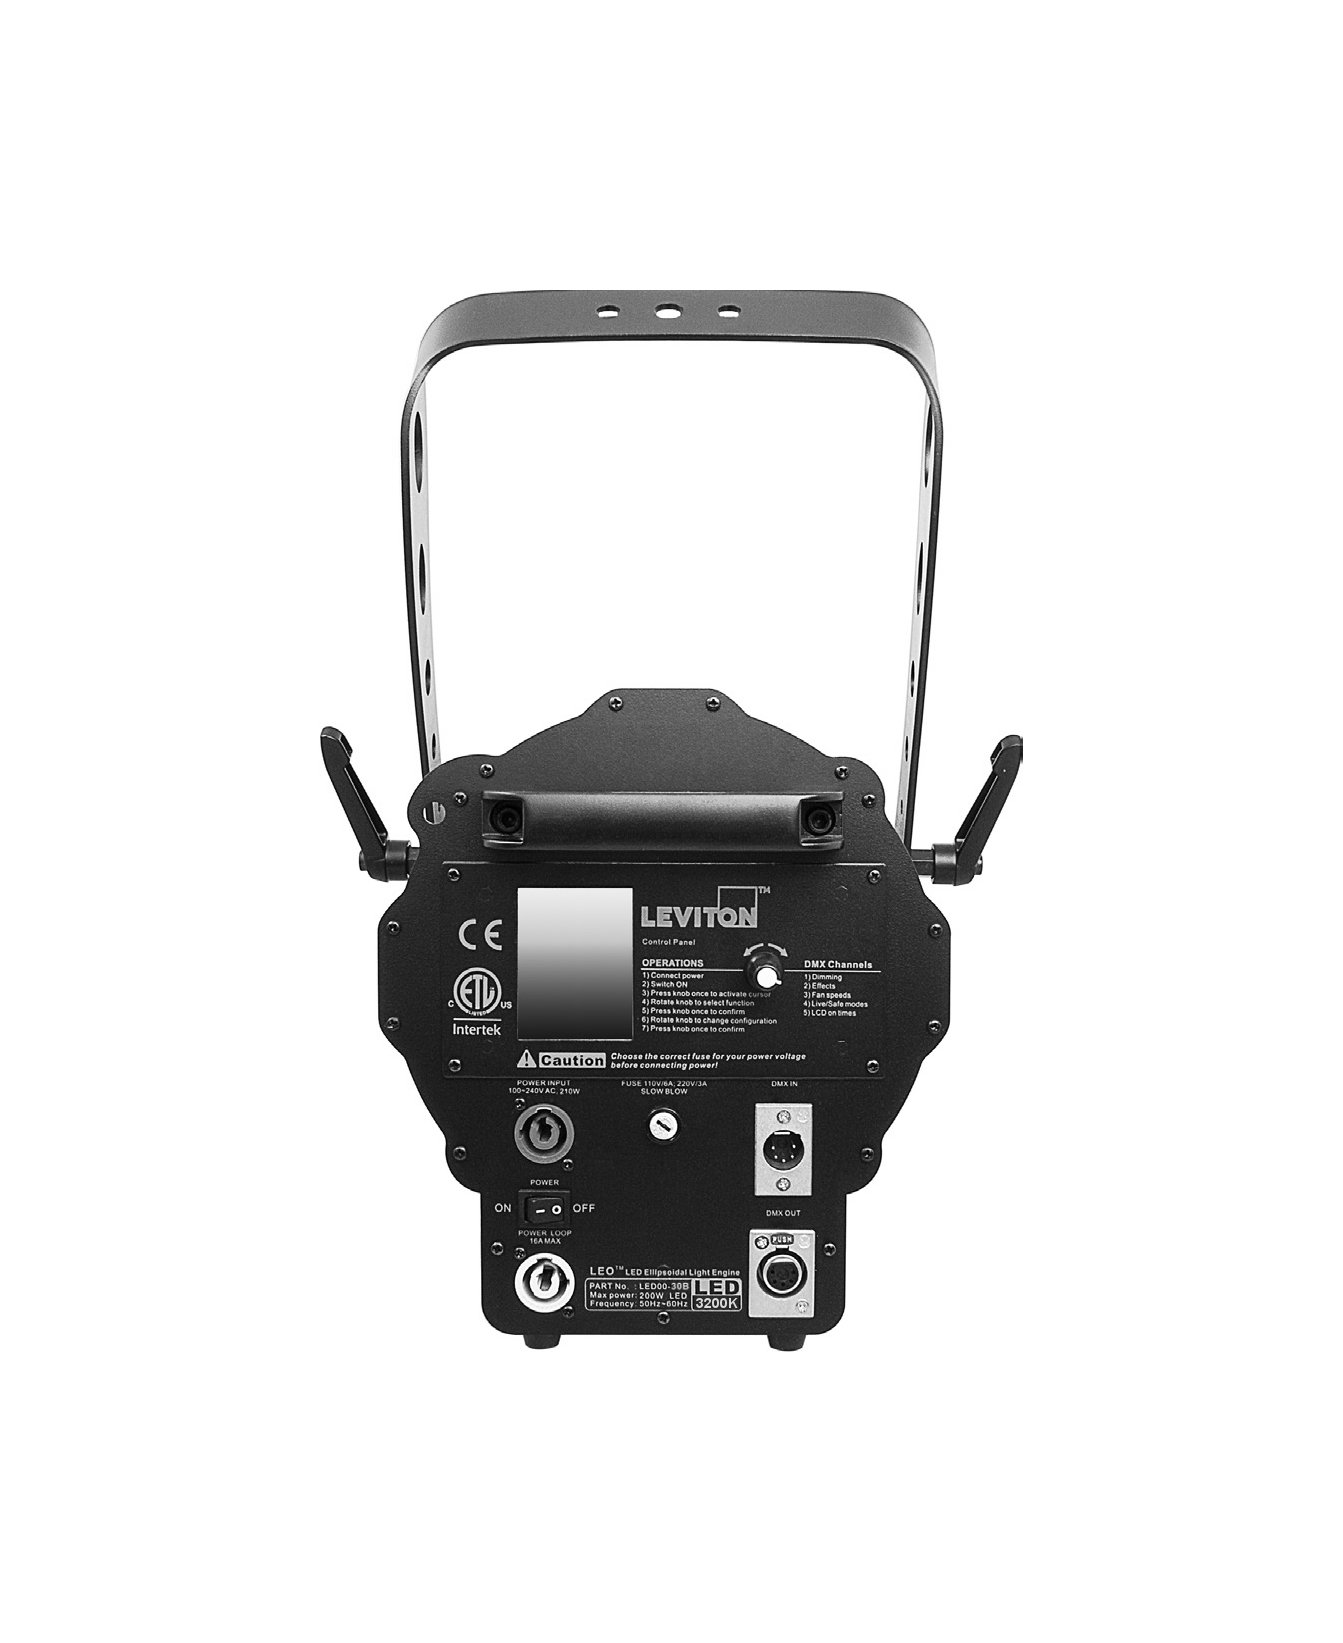 Leviton LED00 30B LEO 3200K LED Ellipsoidal Zoom Fixture in Black ...